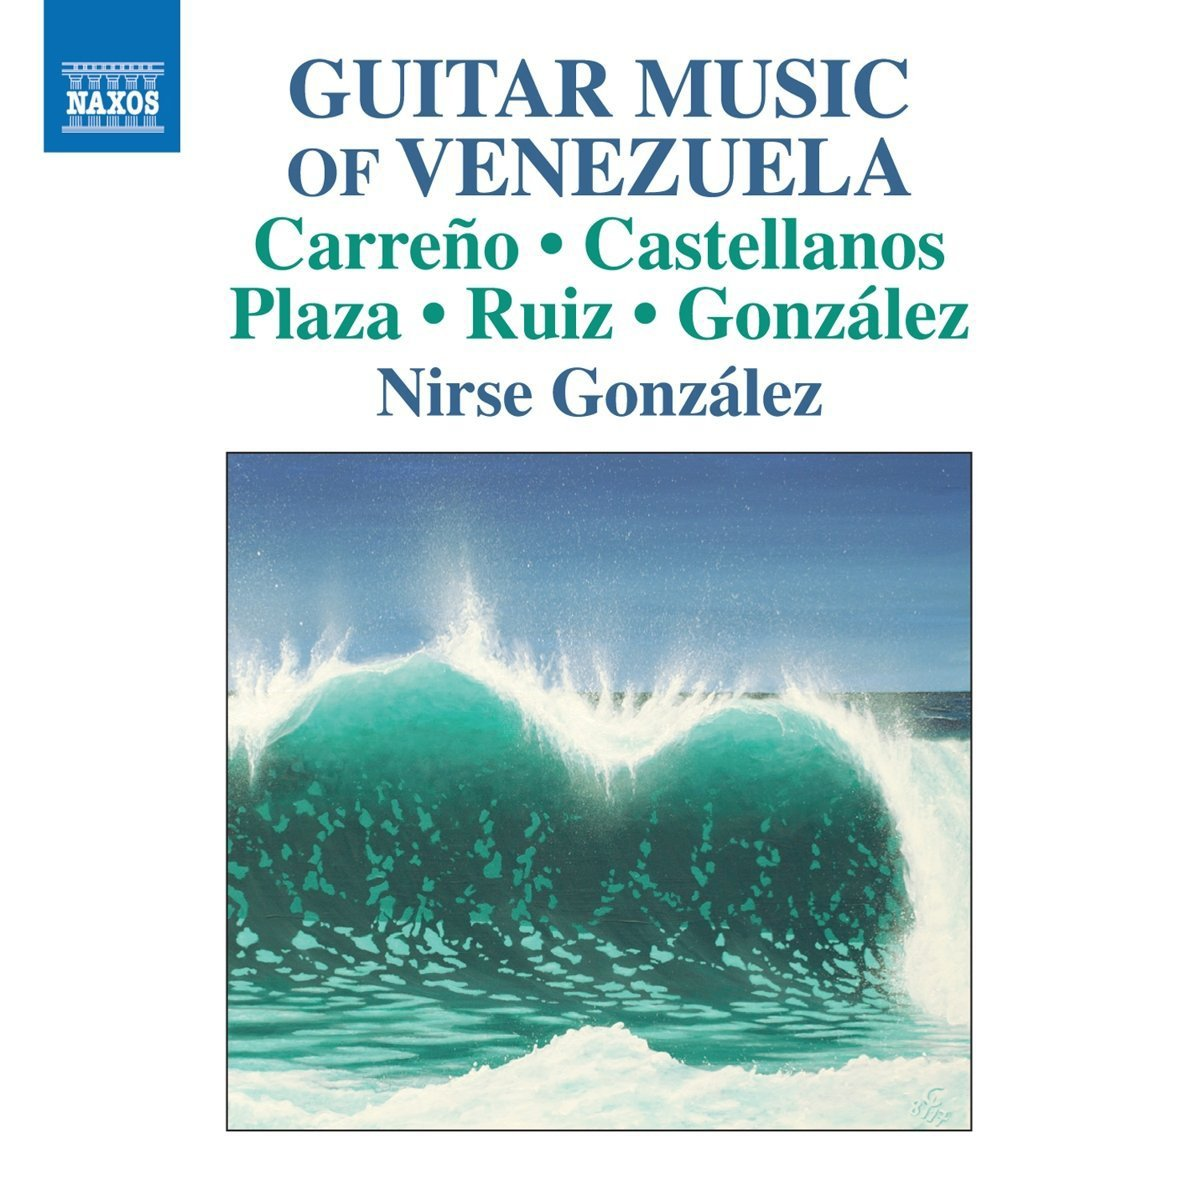 Guitar Luxury Music of Venezuela High quality new